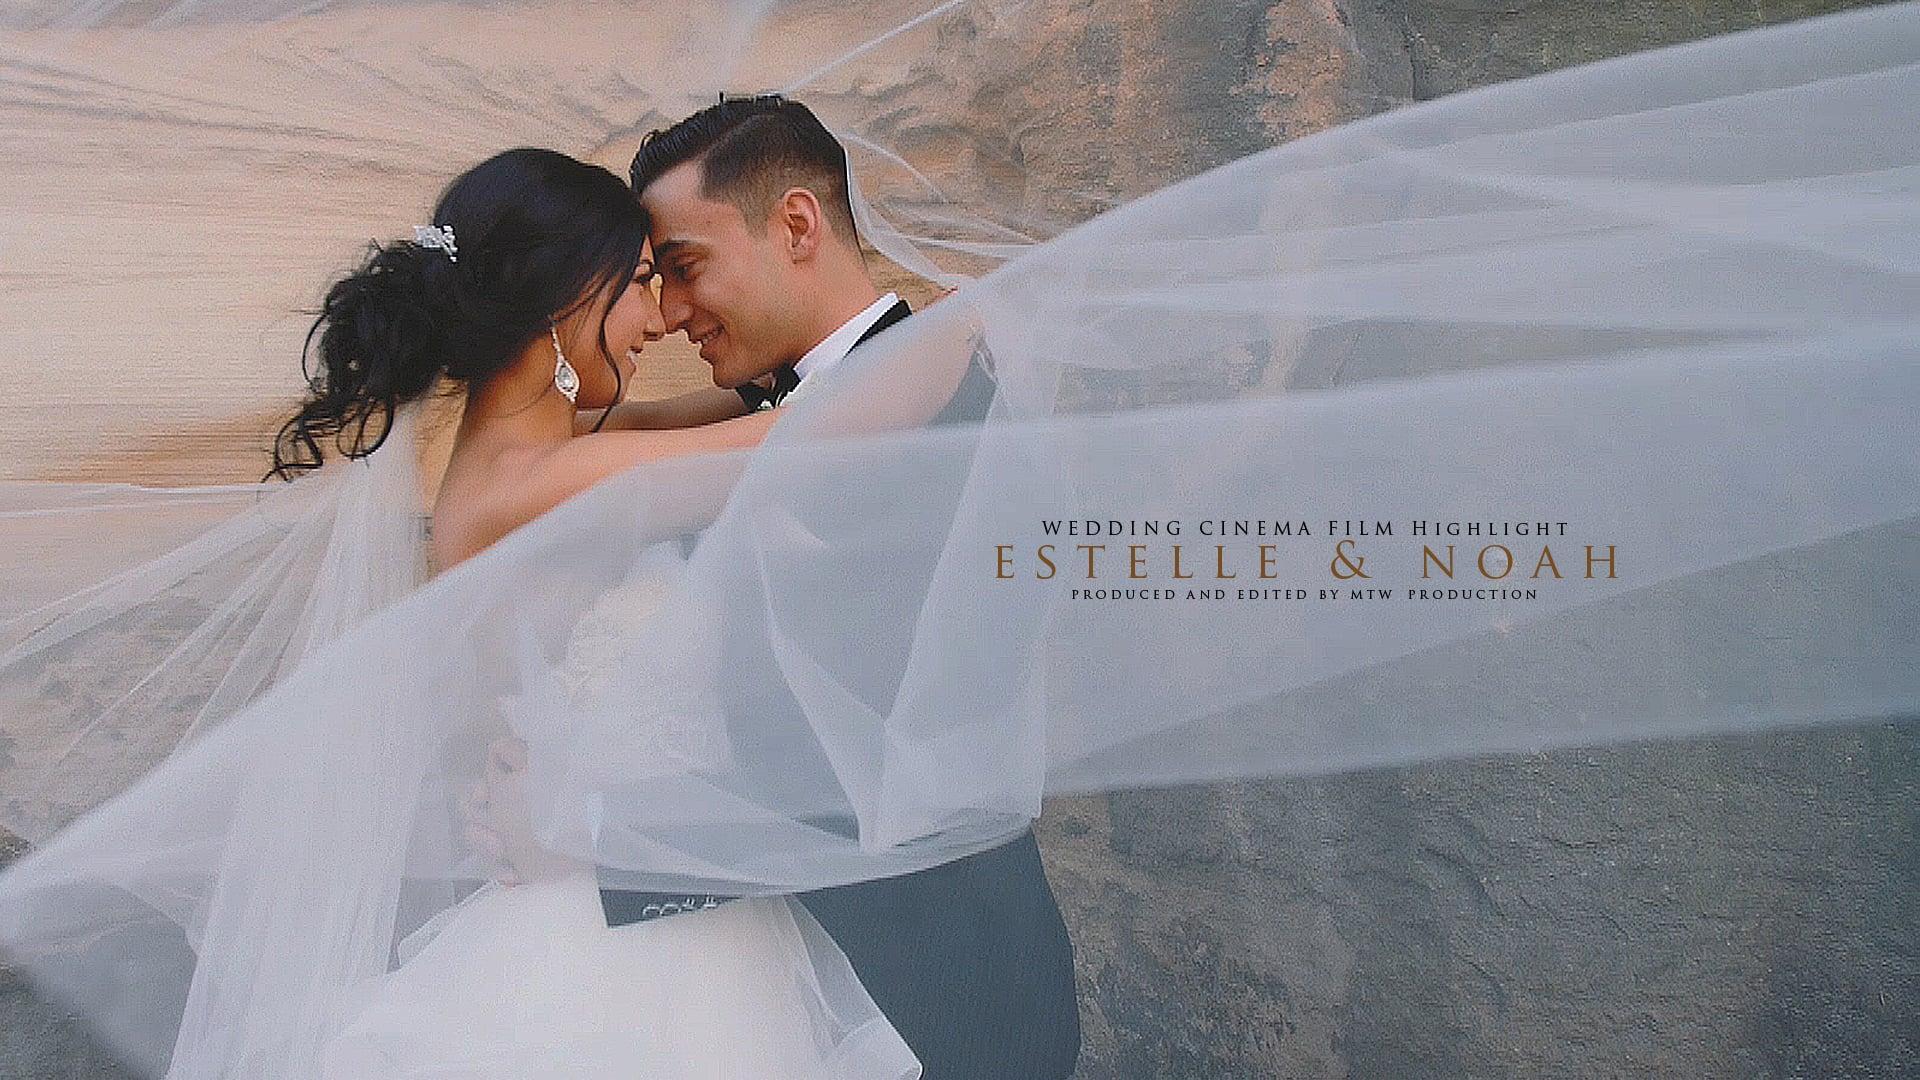 Wedding Cinema Film Highlight | Estelle and Noah